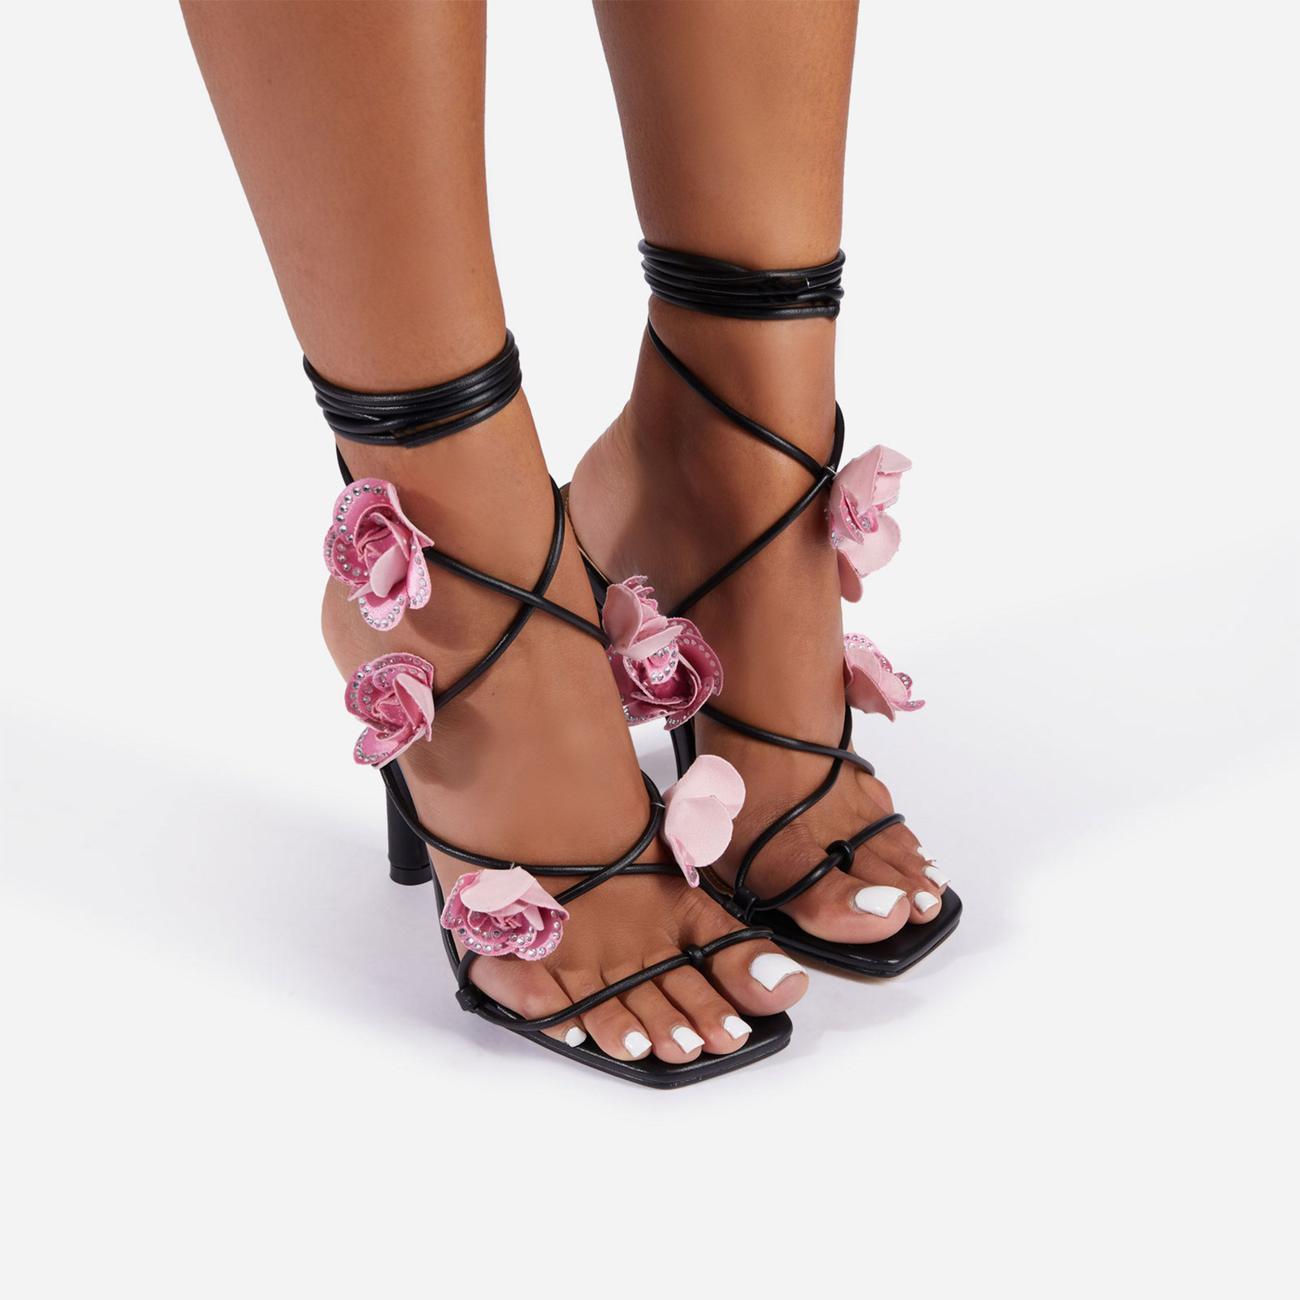 Rose Whip Embellished Floral Detail Lace Up Heel in Black Faux Leather Image 4